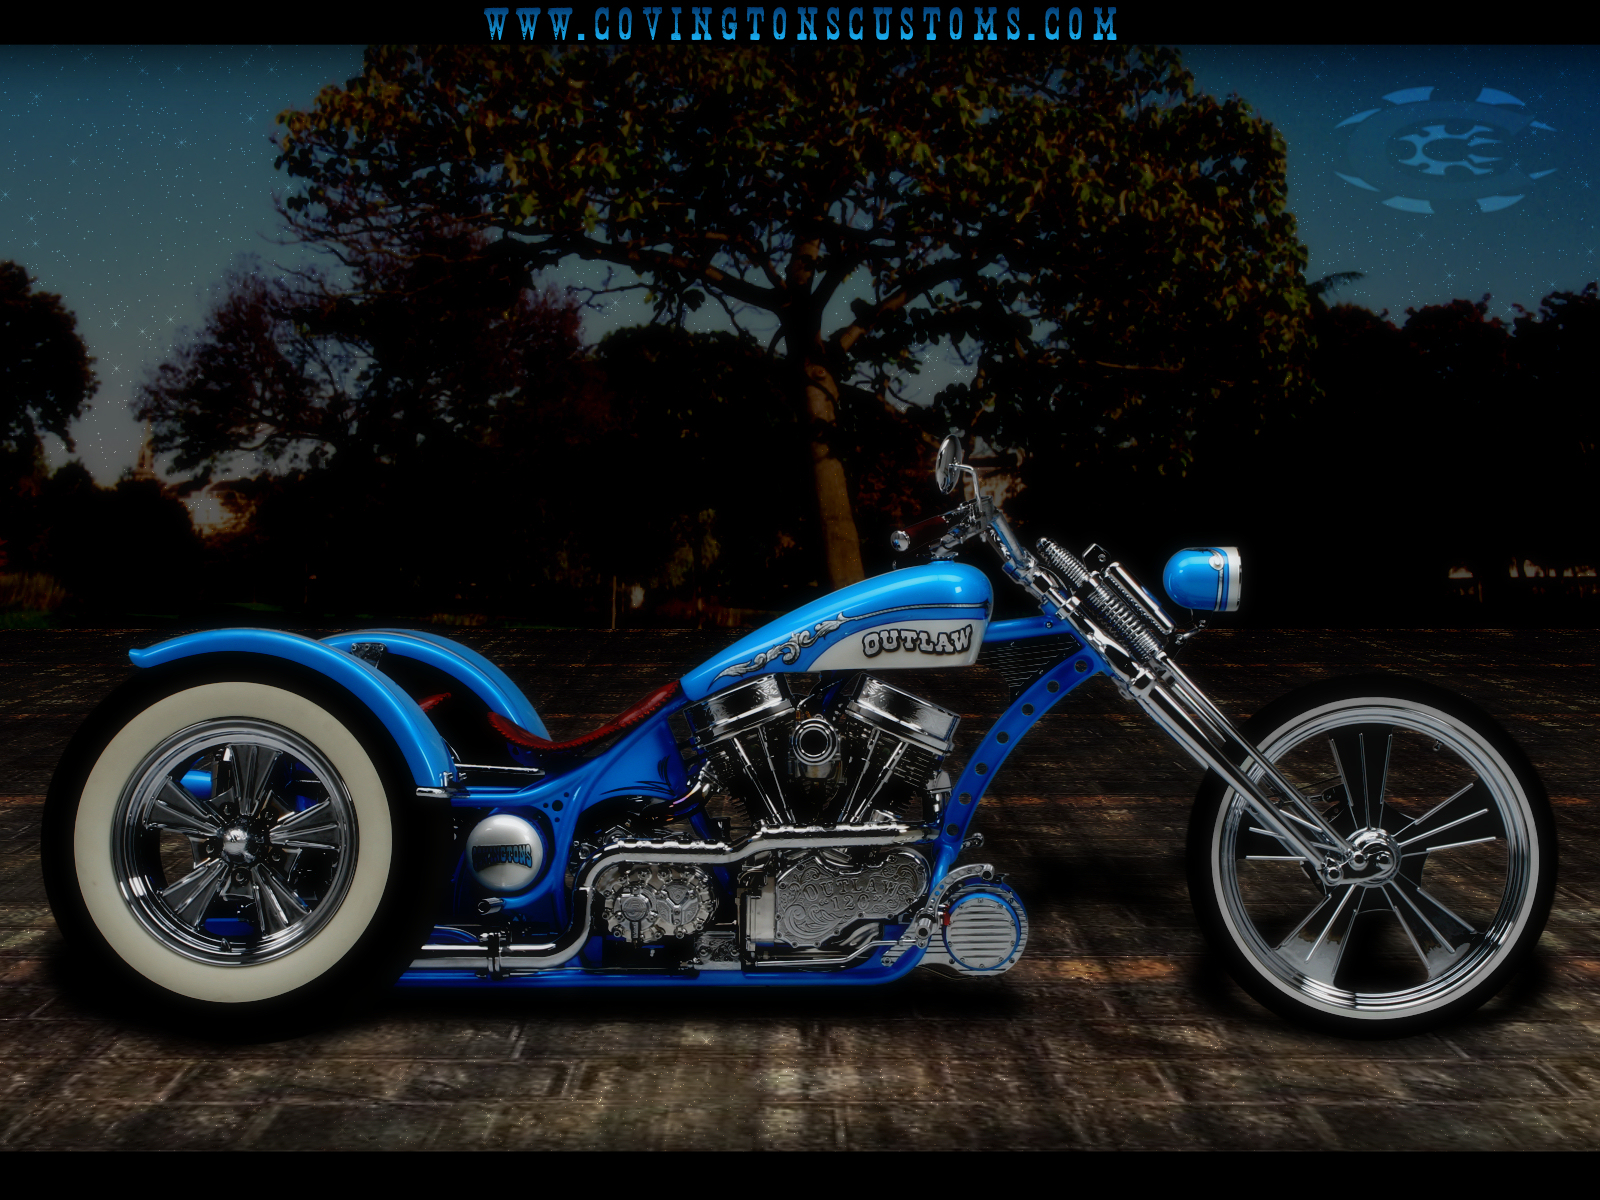 Outlaw Custom Trike Motorcycle by random667 on deviantART 1600x1200